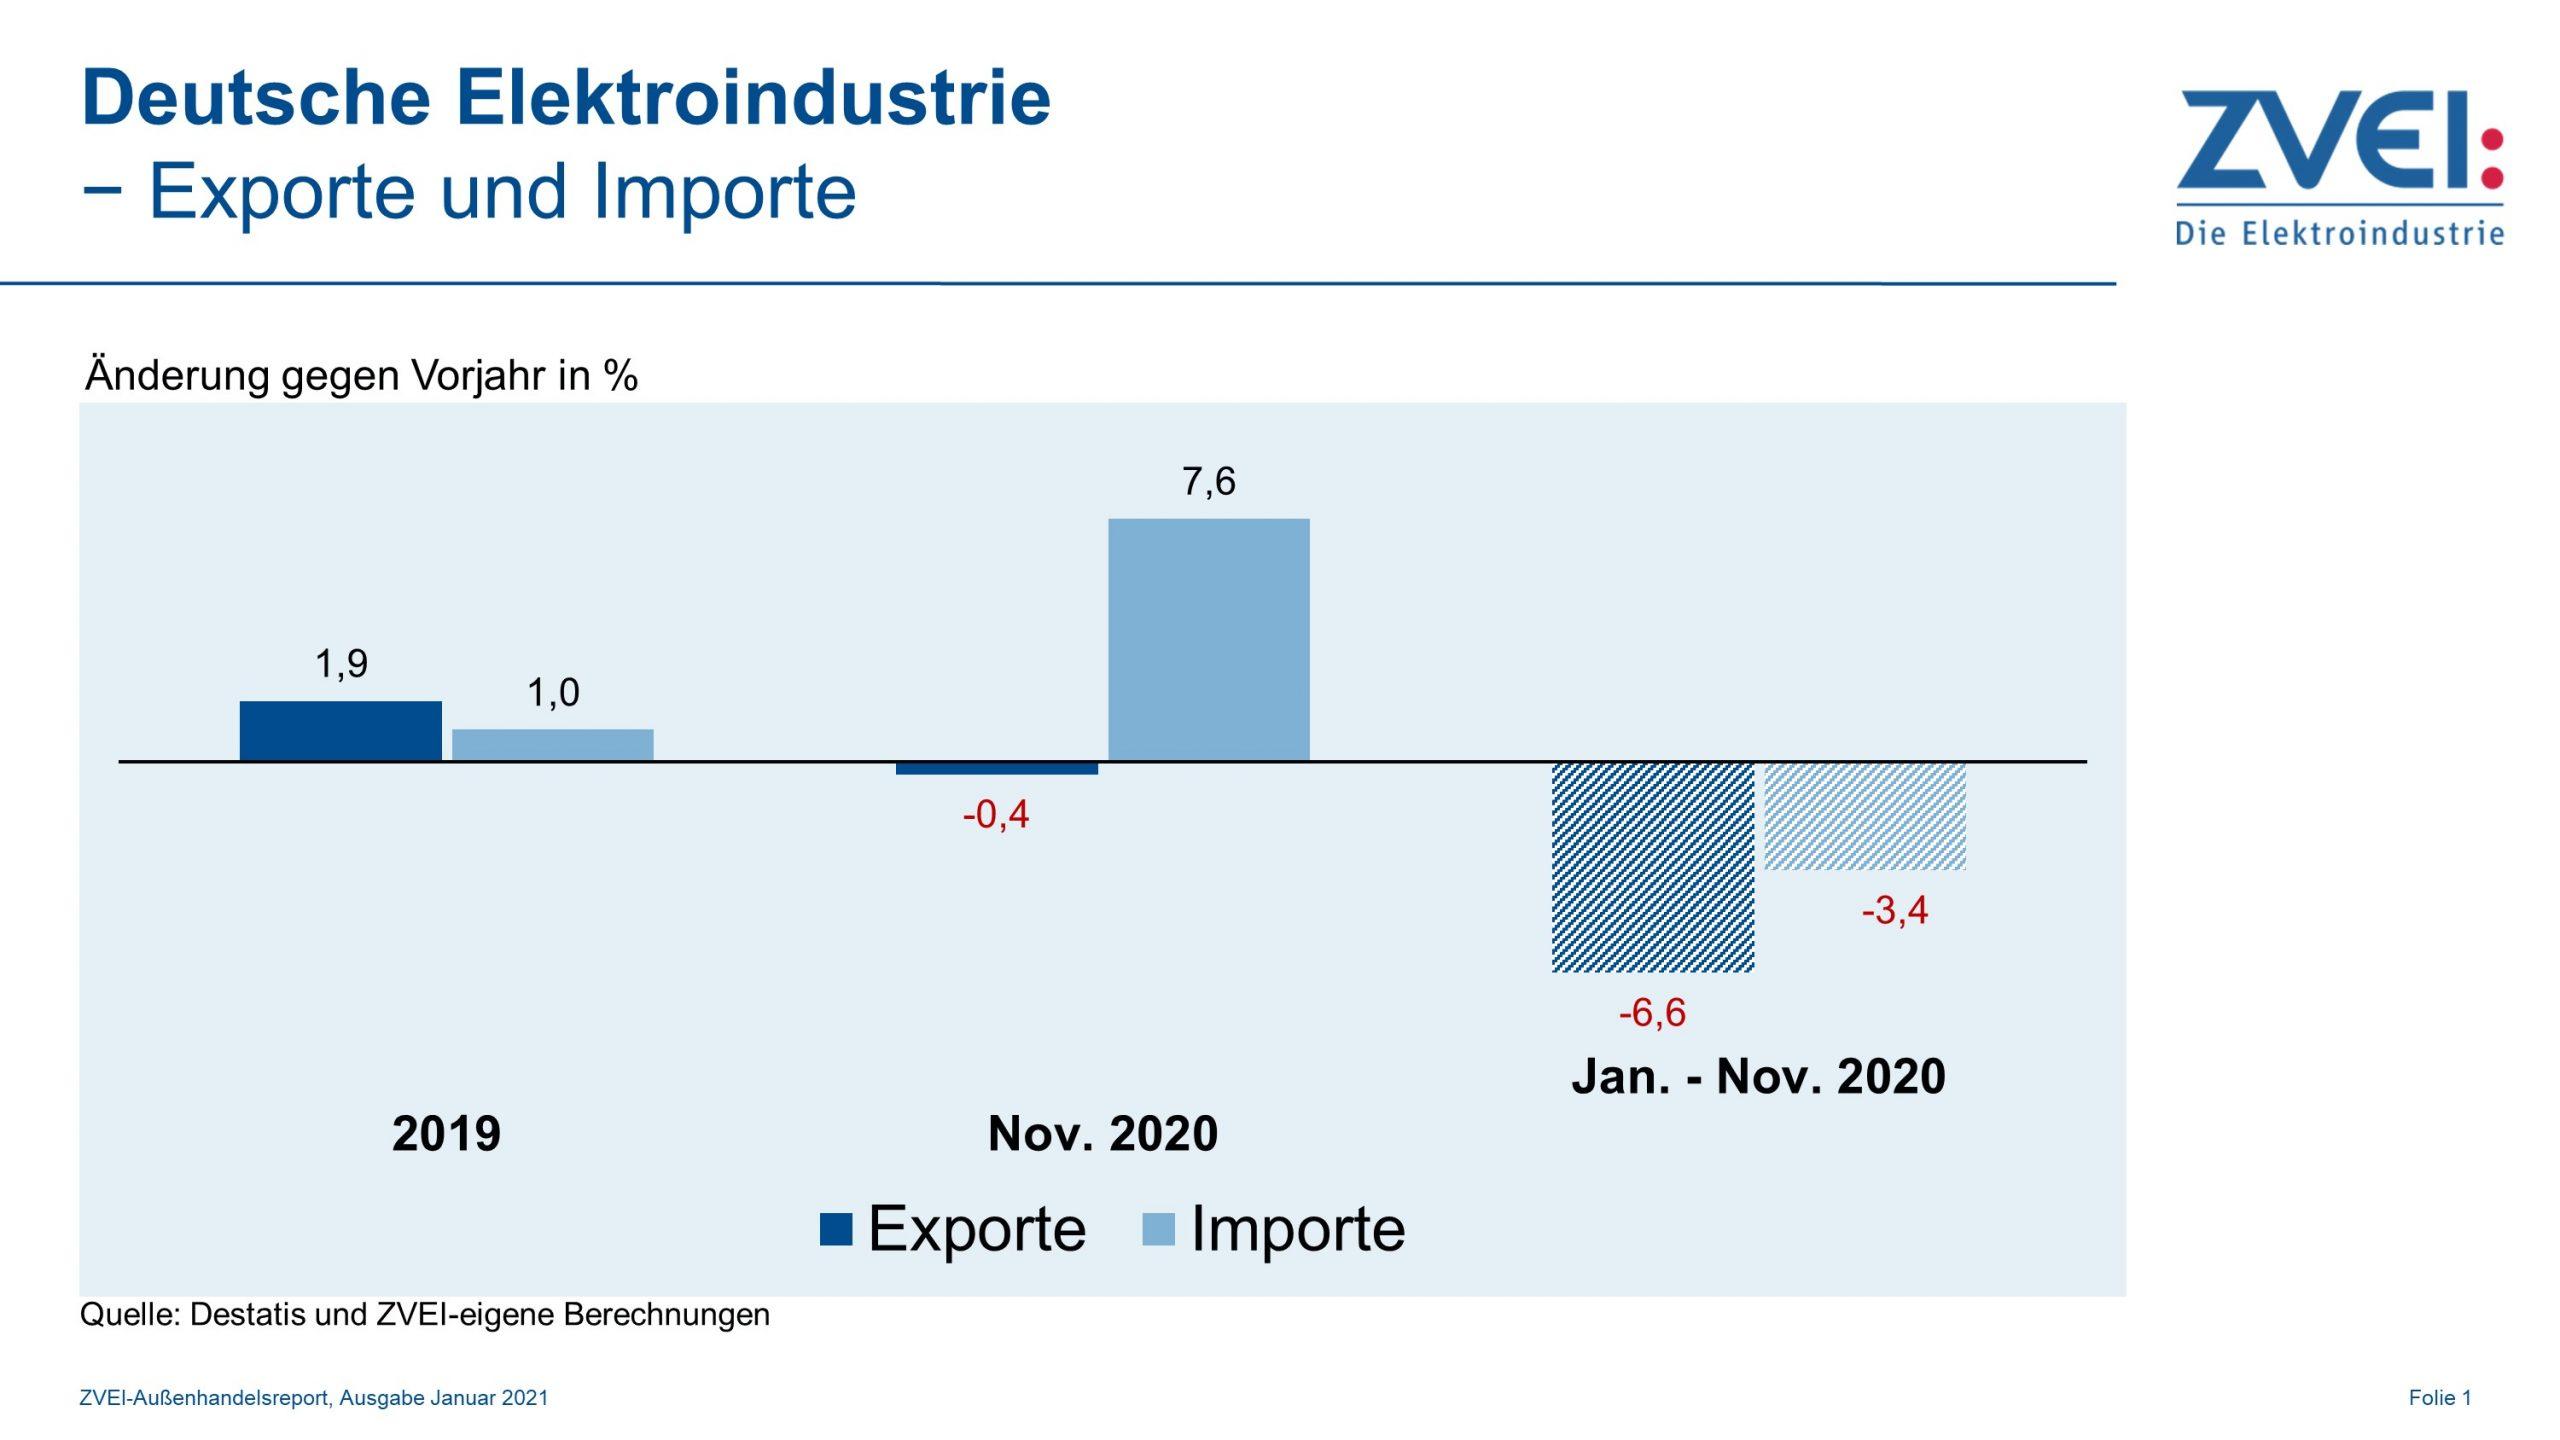 Elektroexporte leicht rückläufig, Importe erholen sich